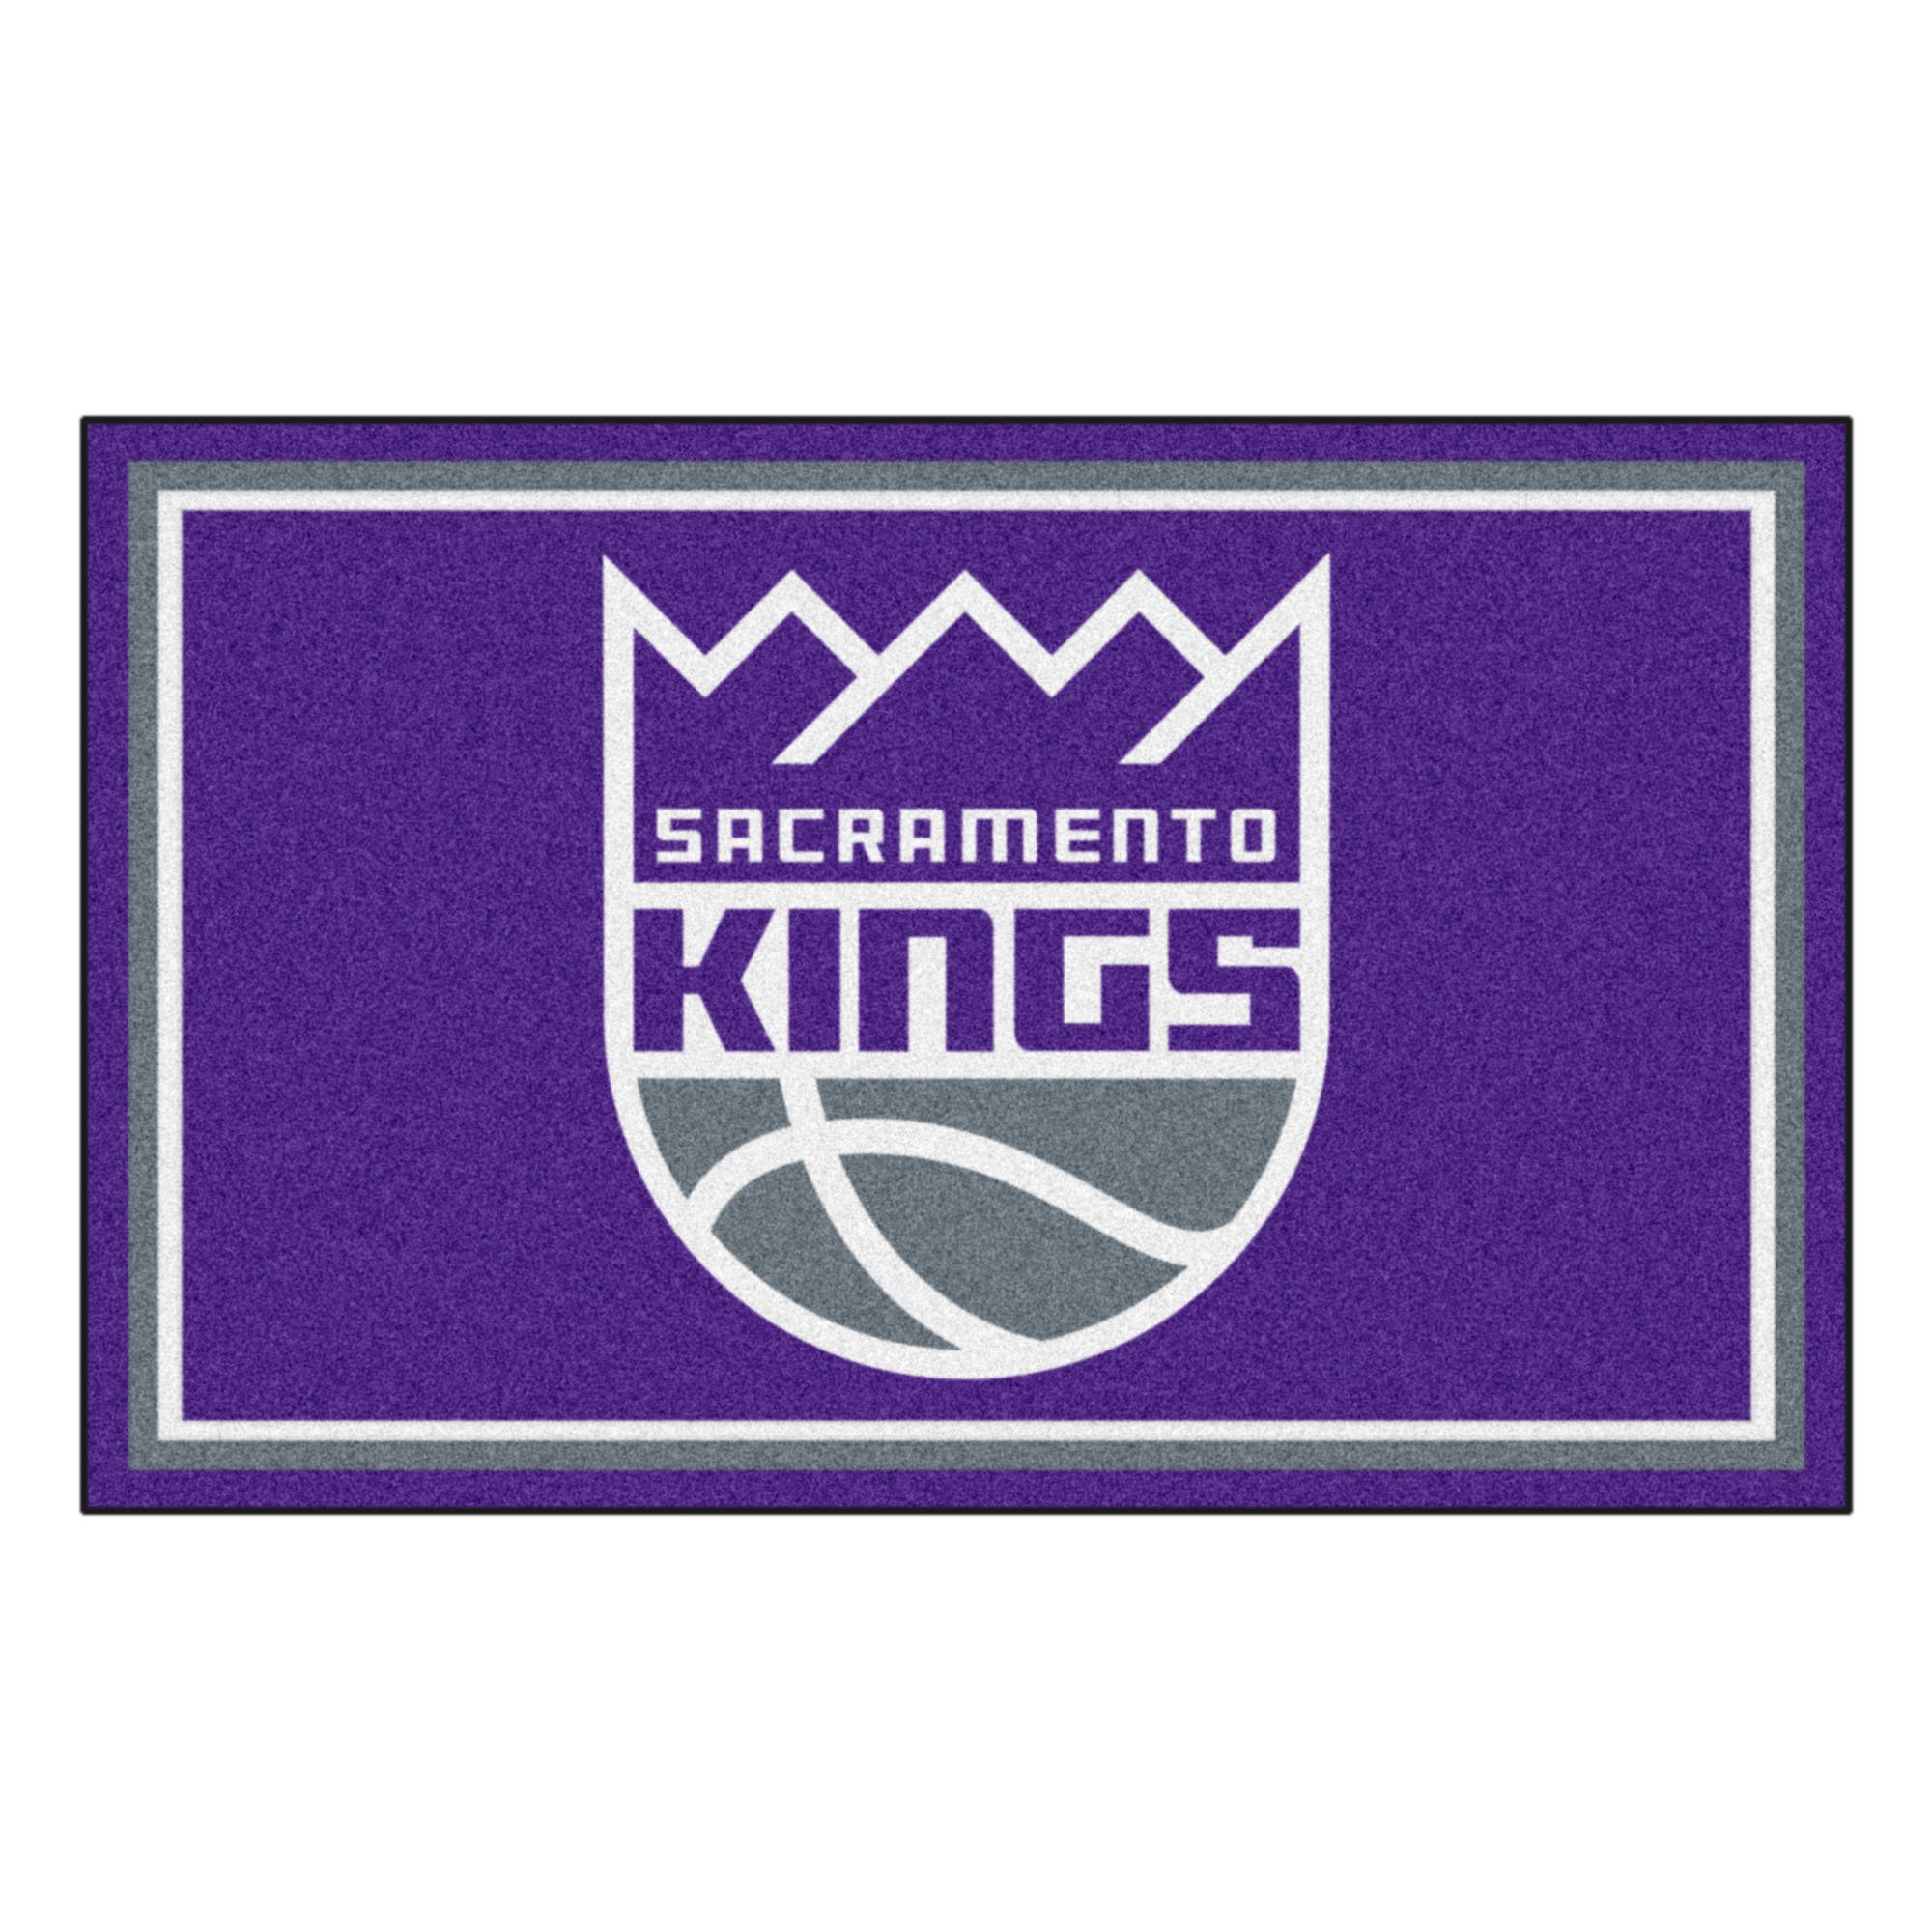 FANMATS 20443 NBA - Sacramento Kings 4'X6' Rug, Team Color, 44''x71'' by Fanmats